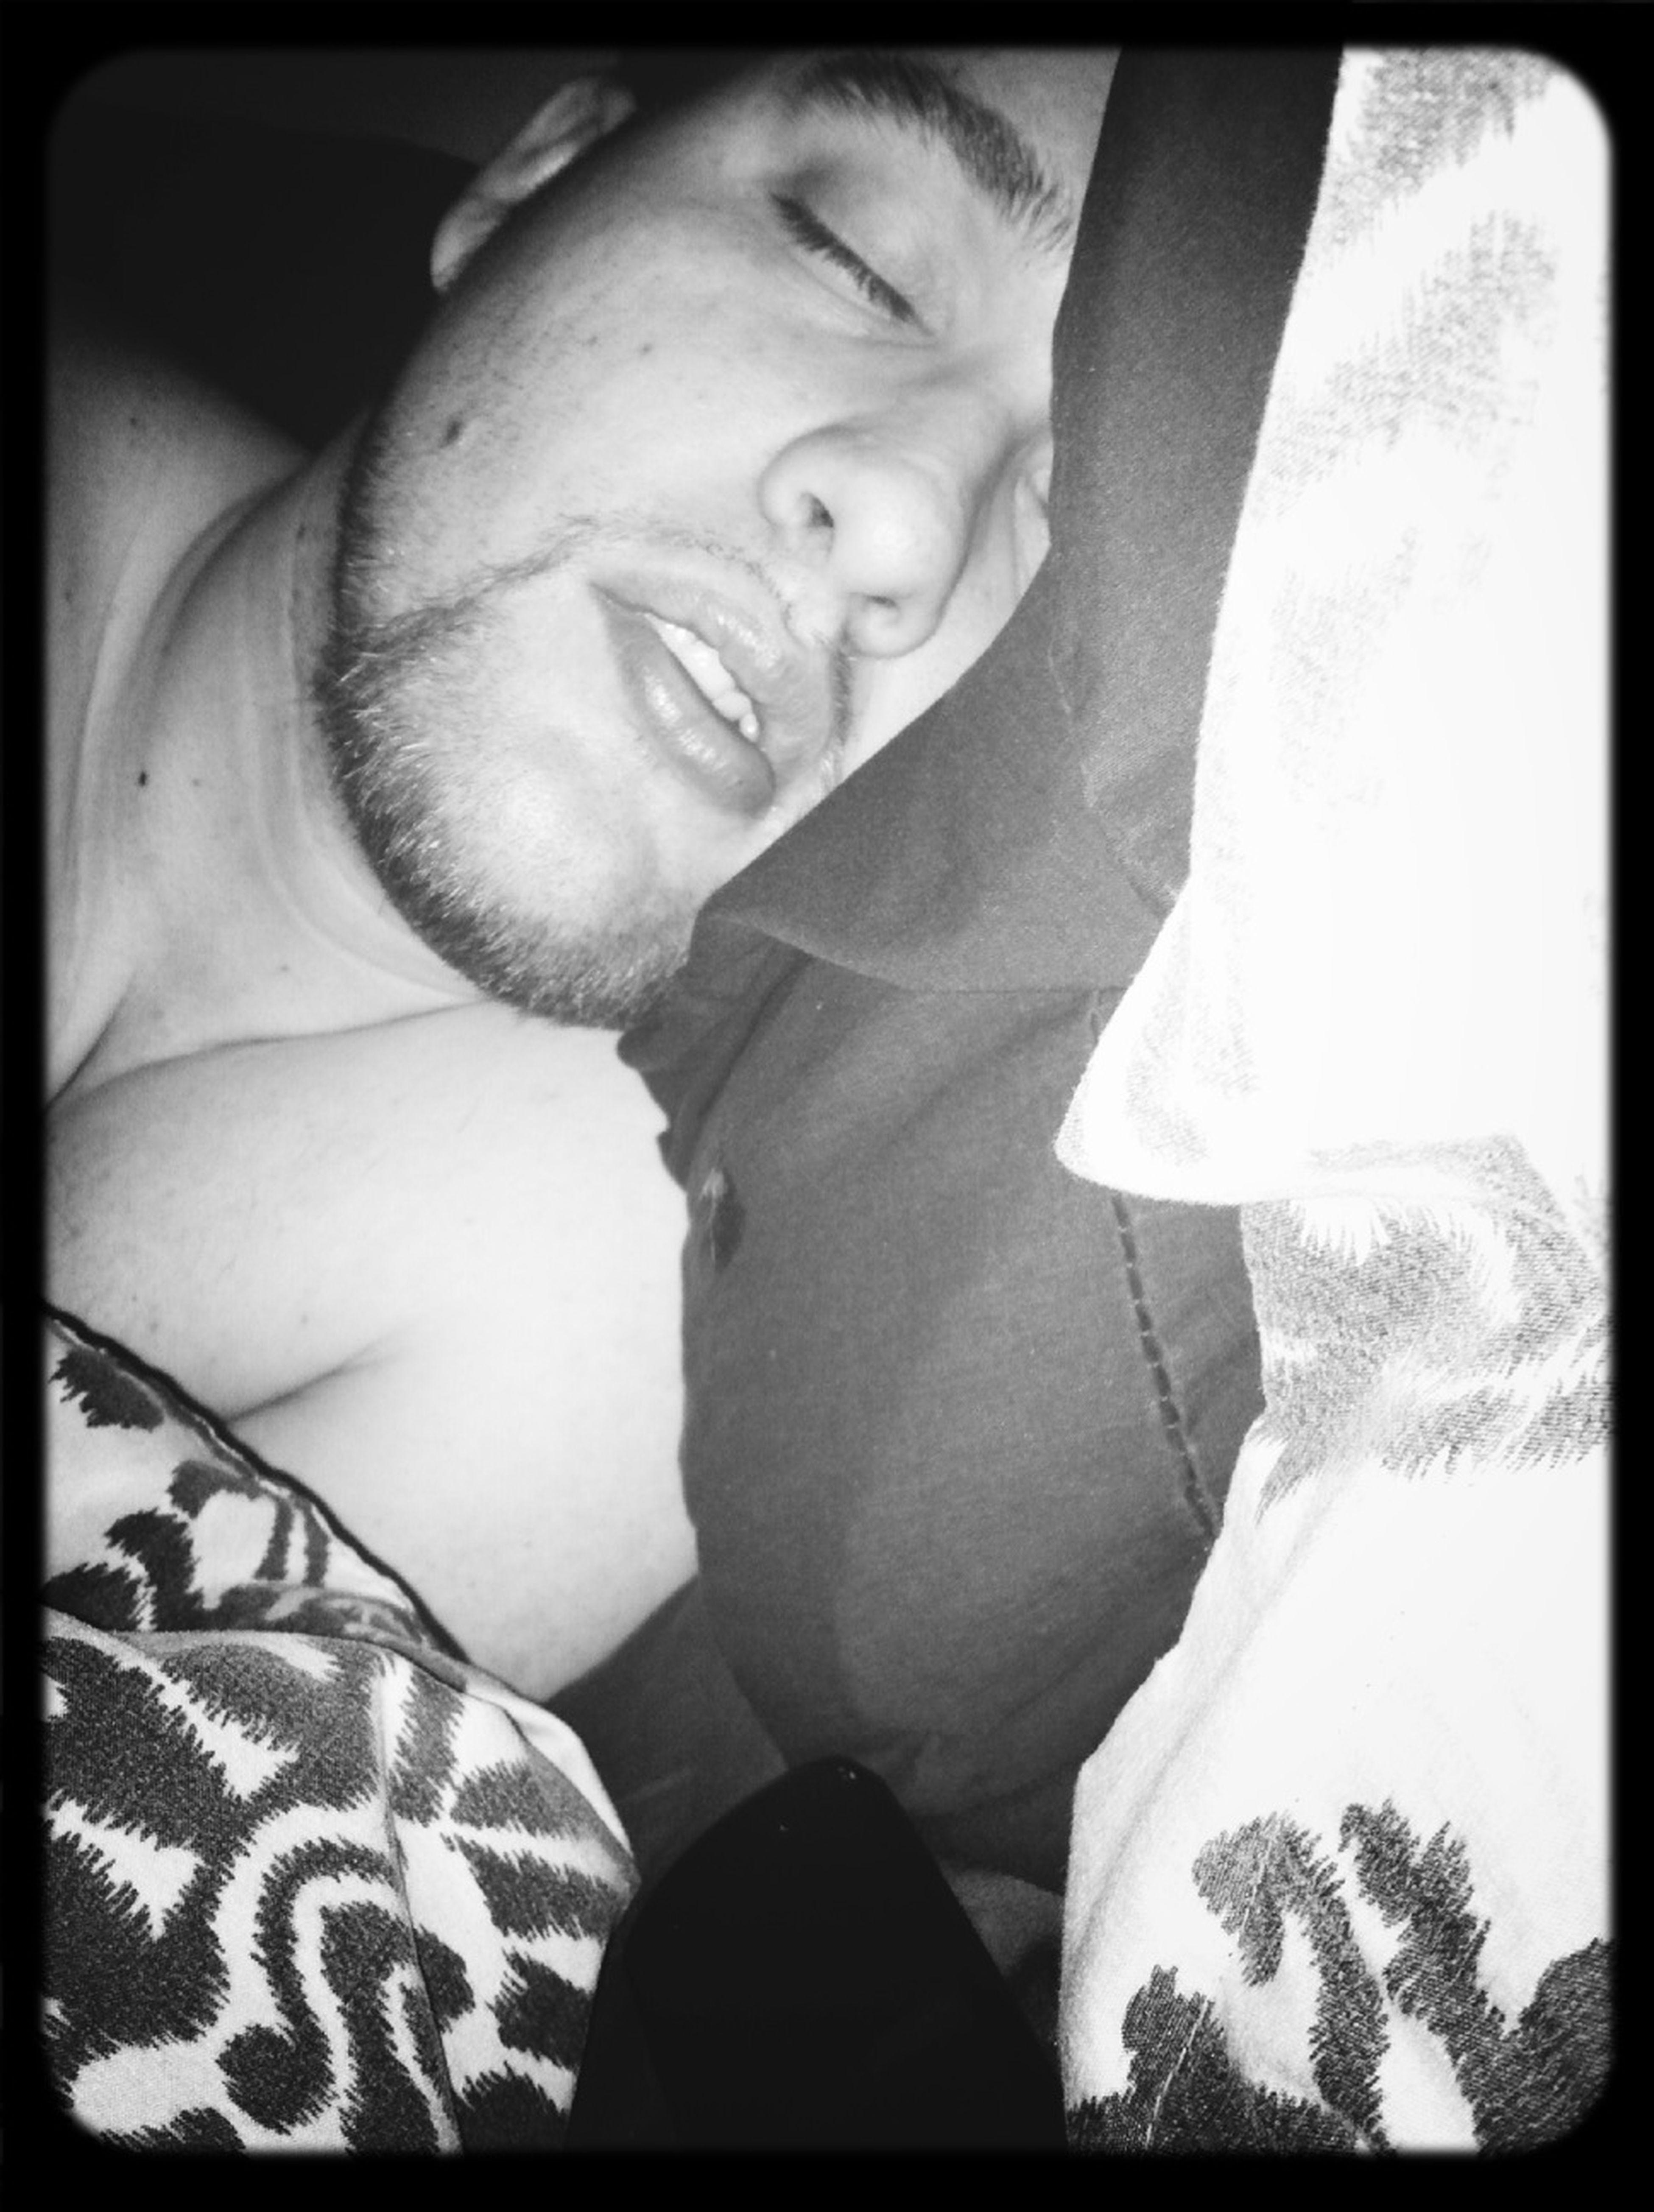 He looks so cute sleeping.. ❤